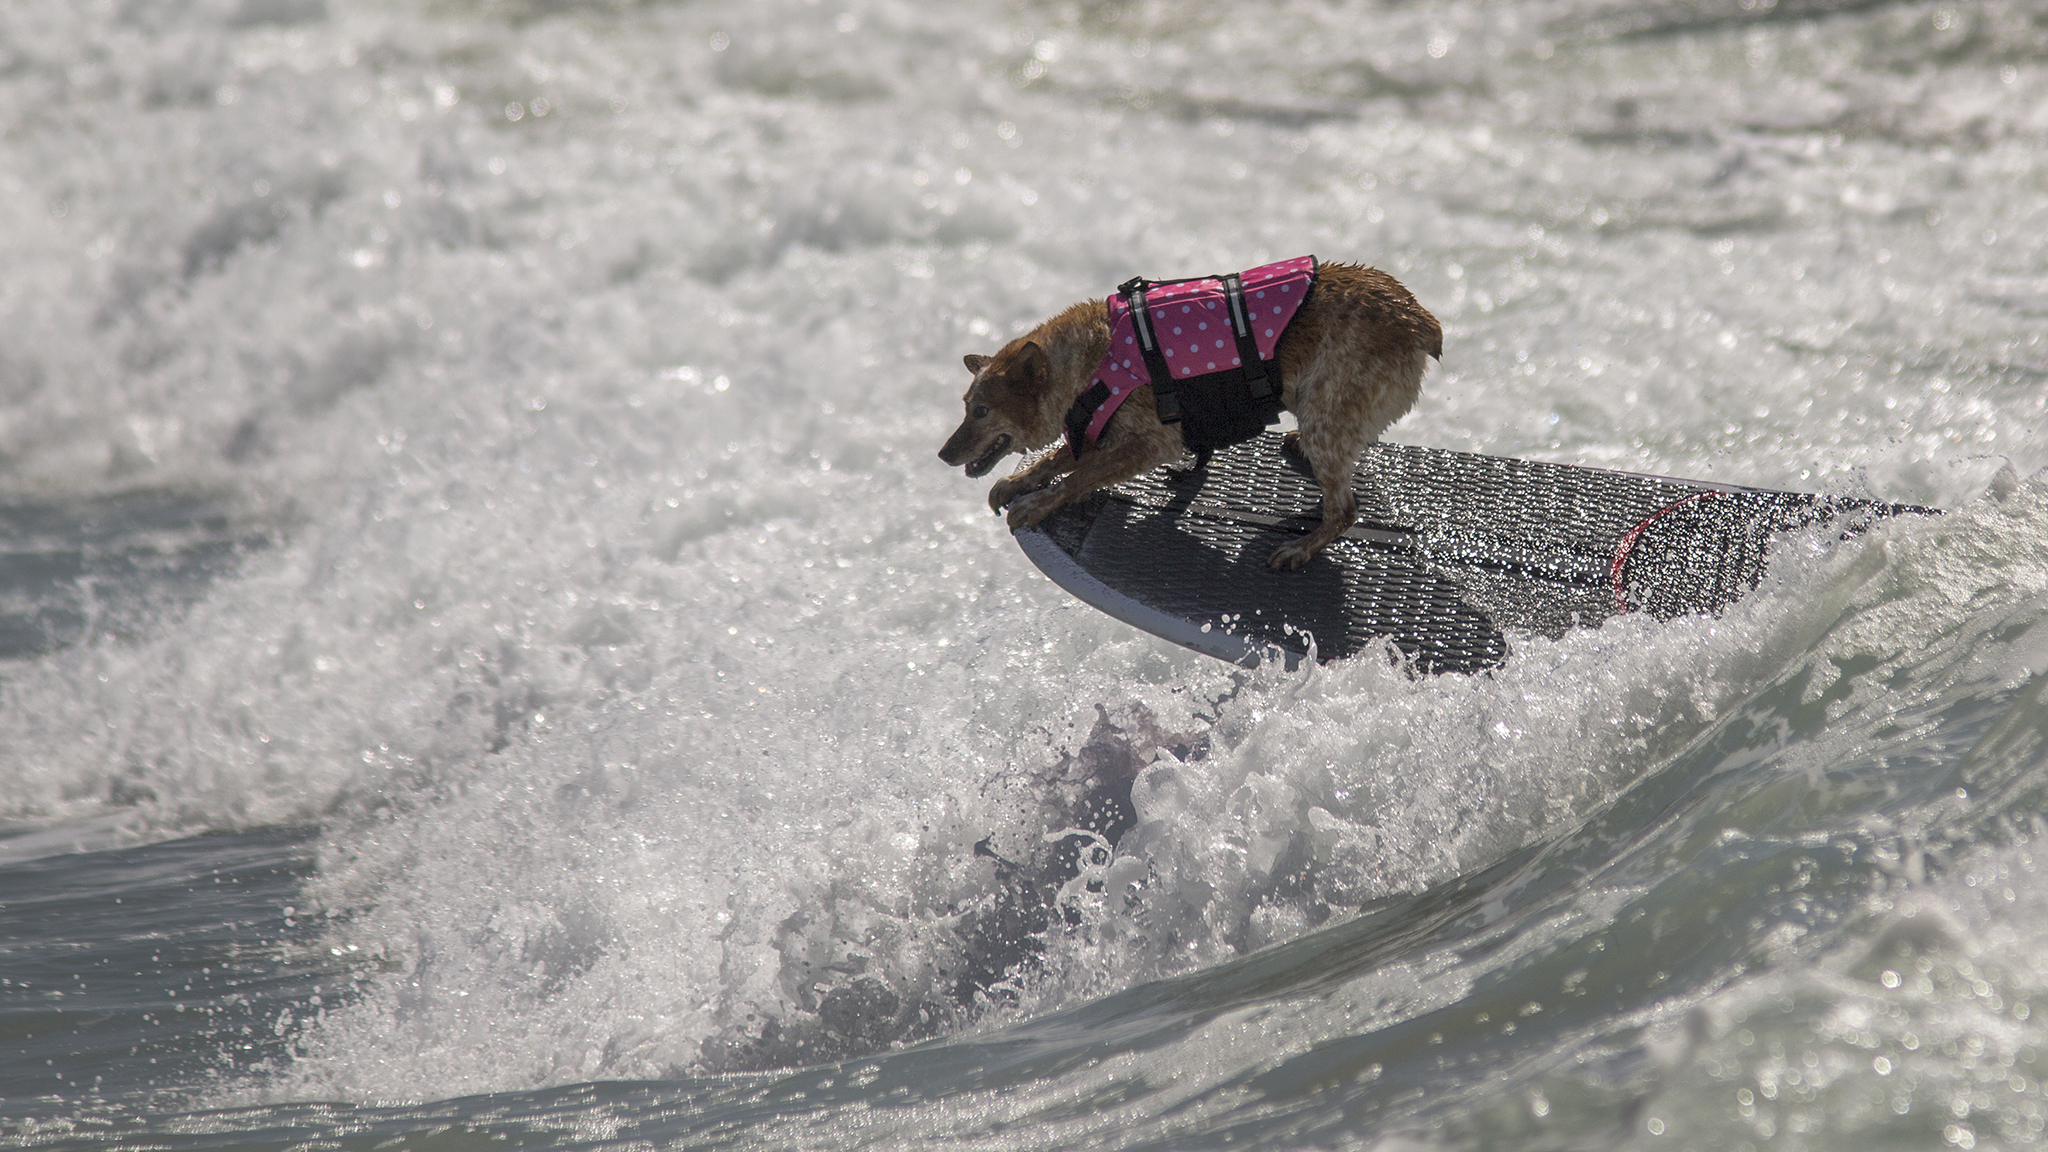 Canine surf skills